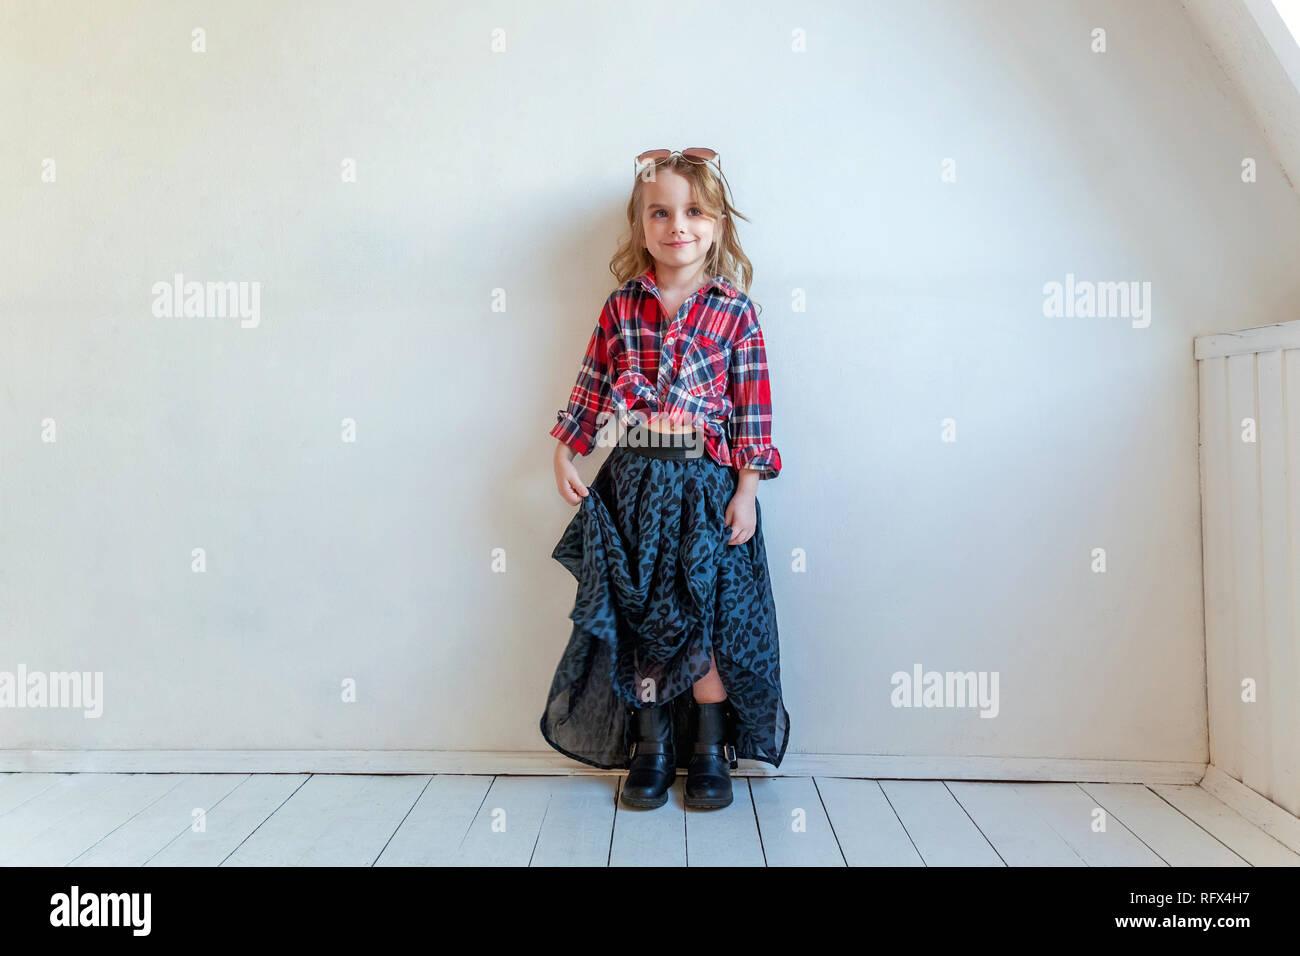 eb09075c753ae Sweet happy fashion adorable petite fille habillée comme hippie hippie  gypsy cowboy dans lunettes standing against